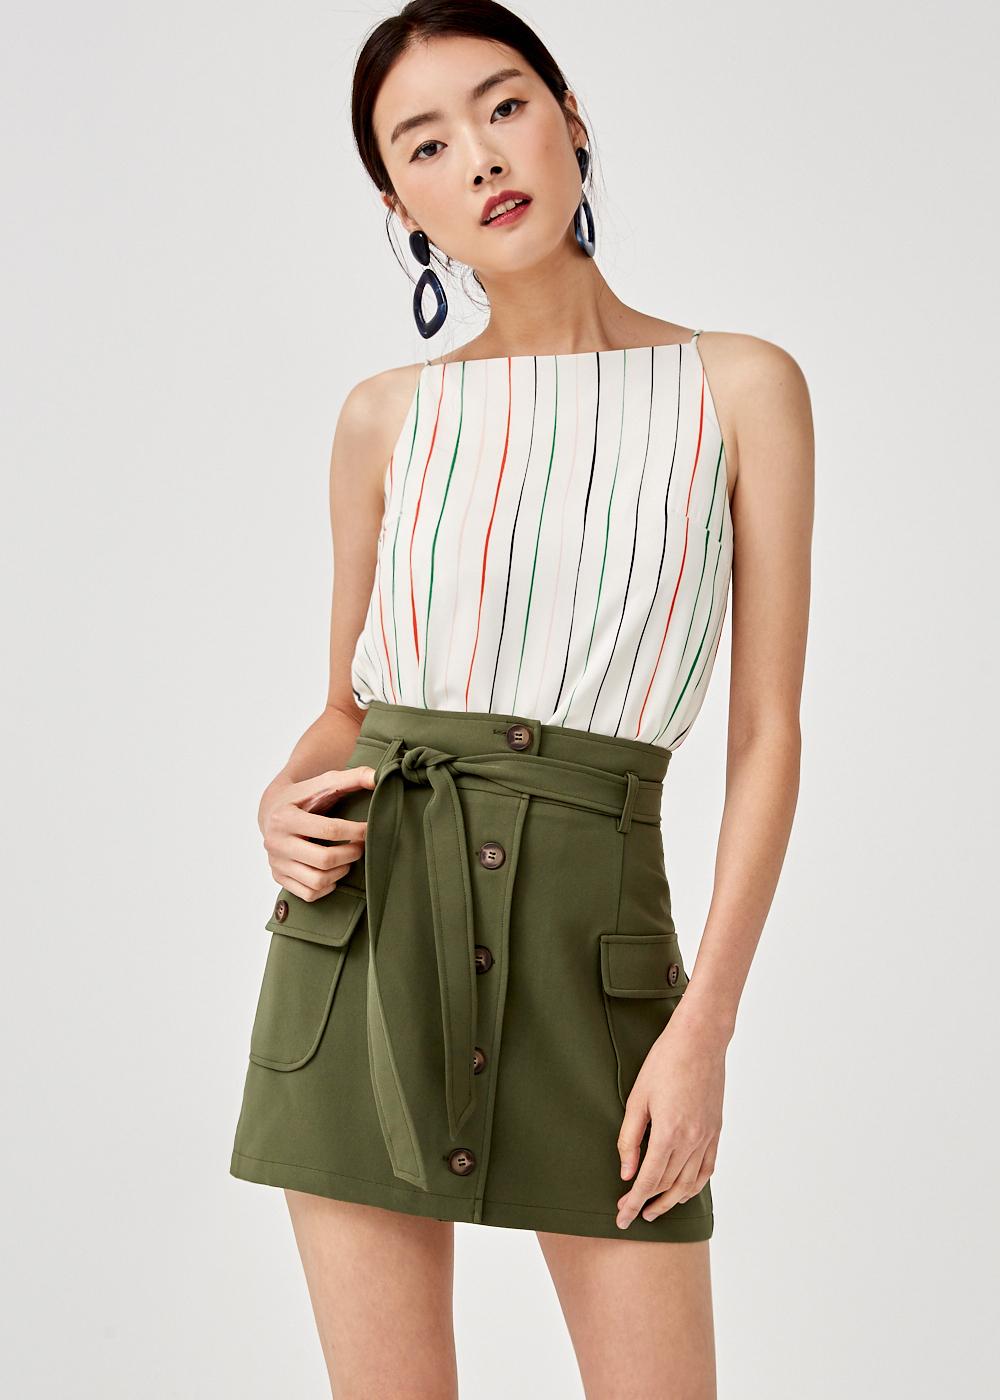 Alayna Square Neck Camisole Top in Sunburst Stripe